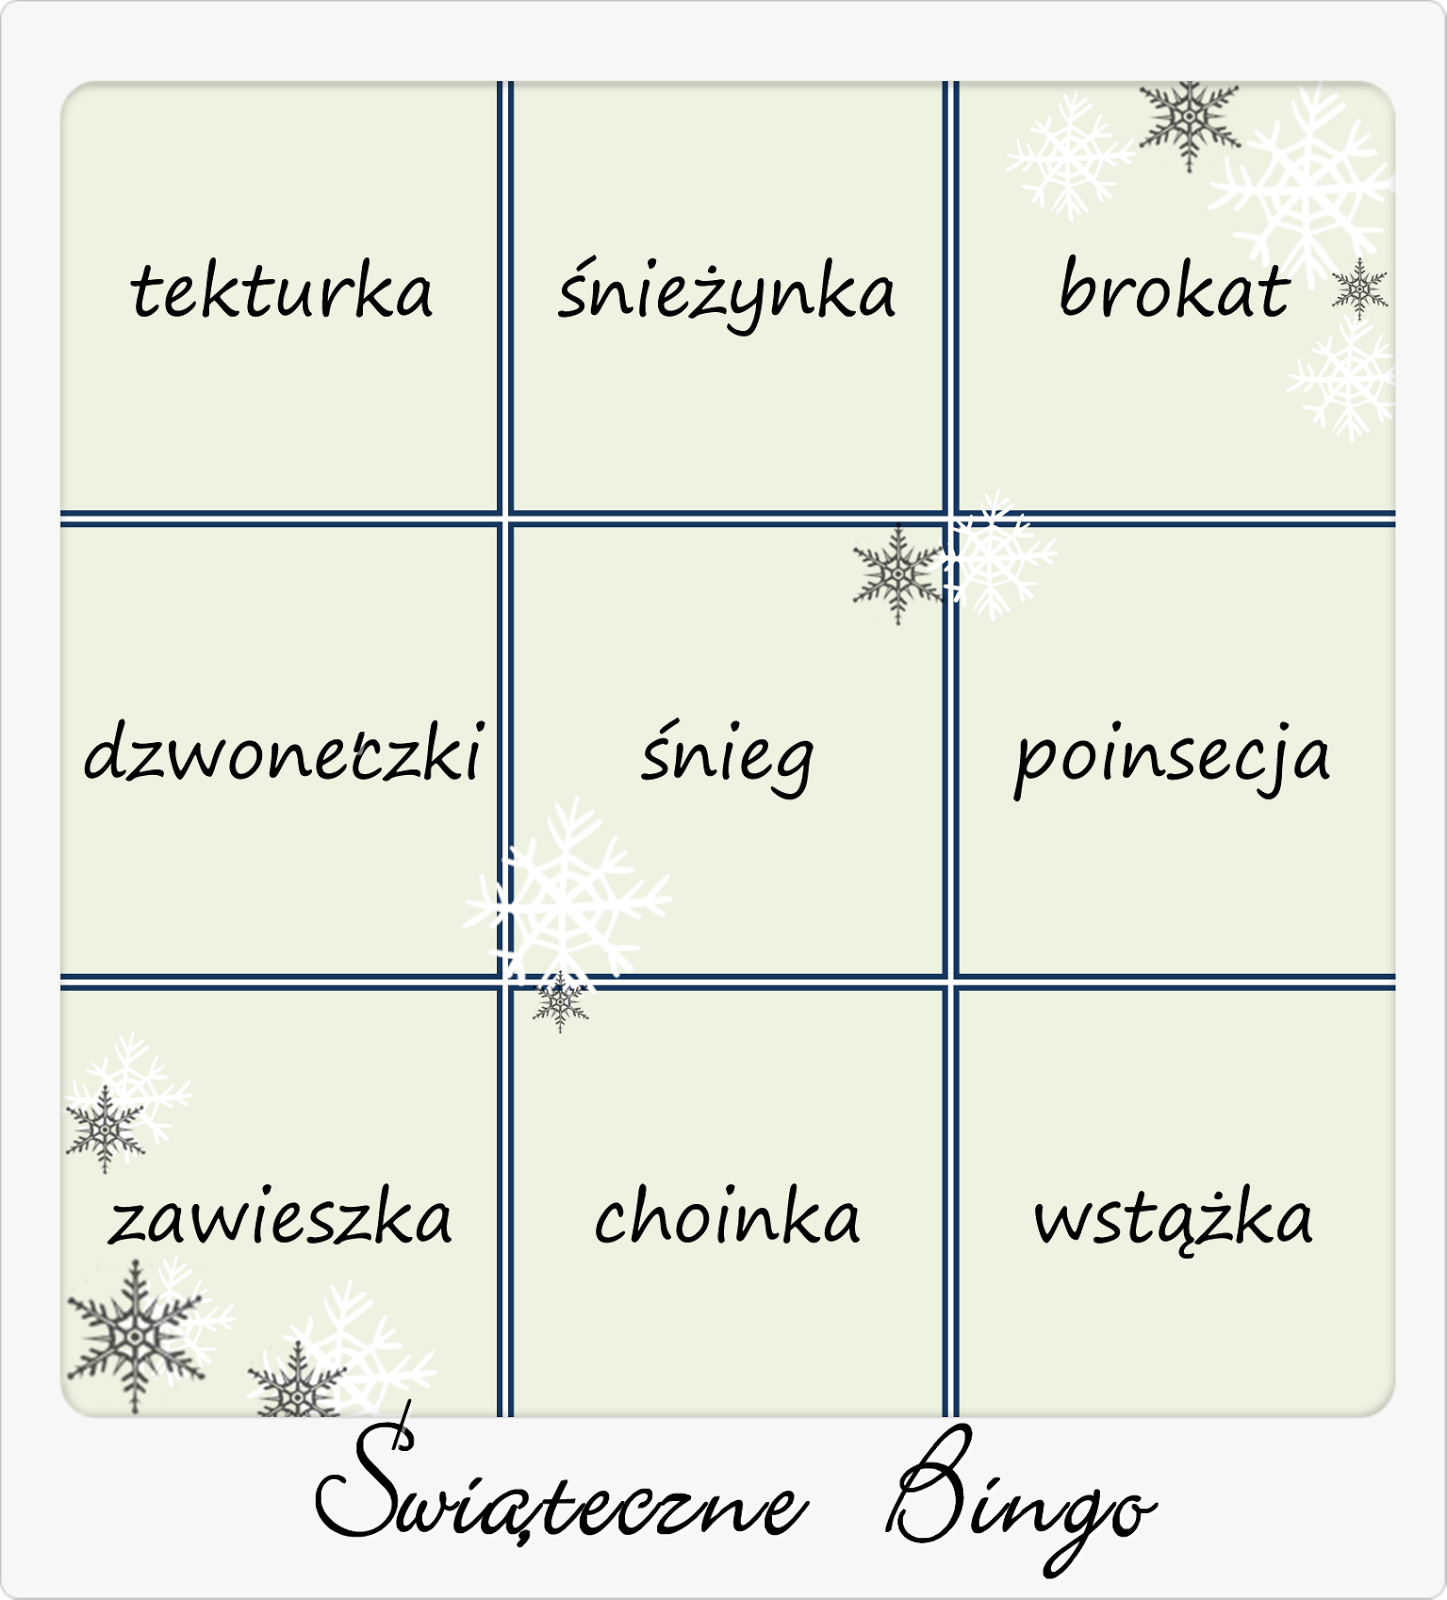 http://scrapikowo.blogspot.com/2014/12/swiateczne-bingo.html